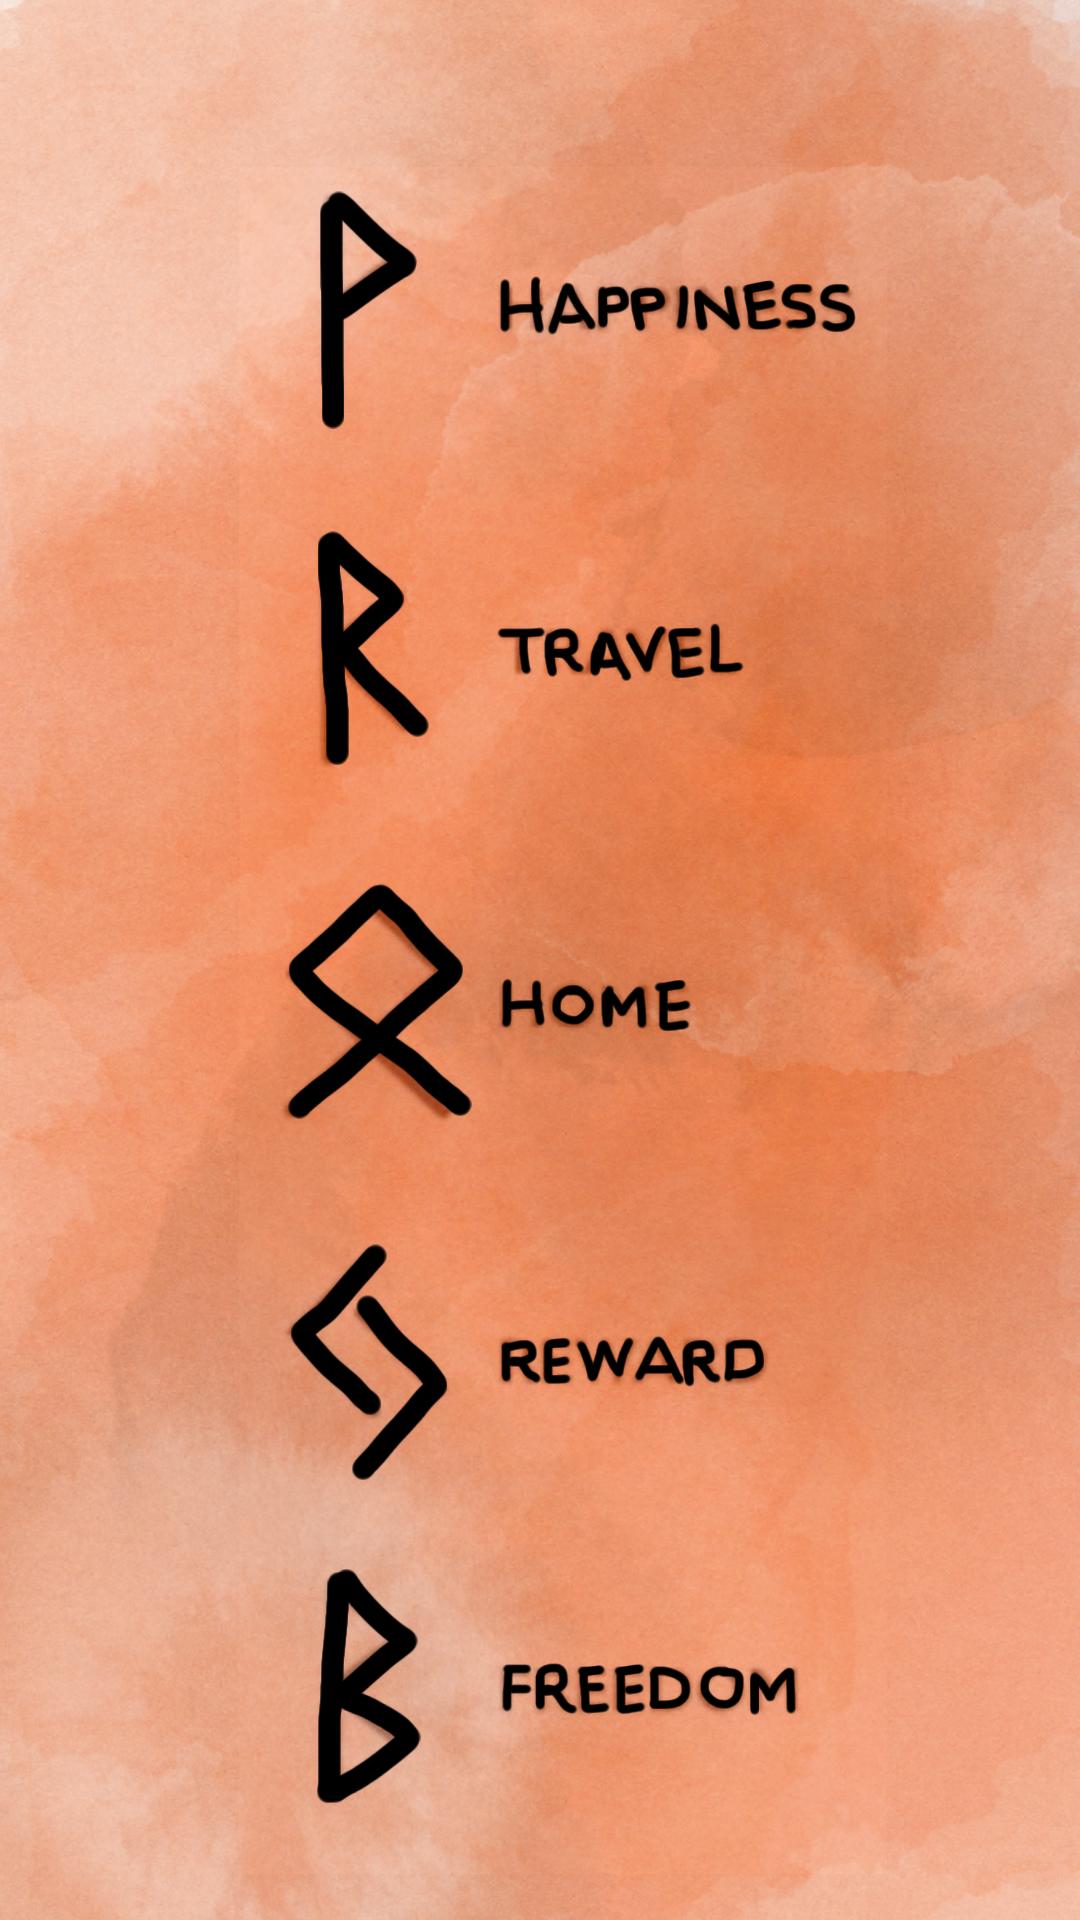 Bind Runes Happiness, Travel, Home, Reward, Freedom in